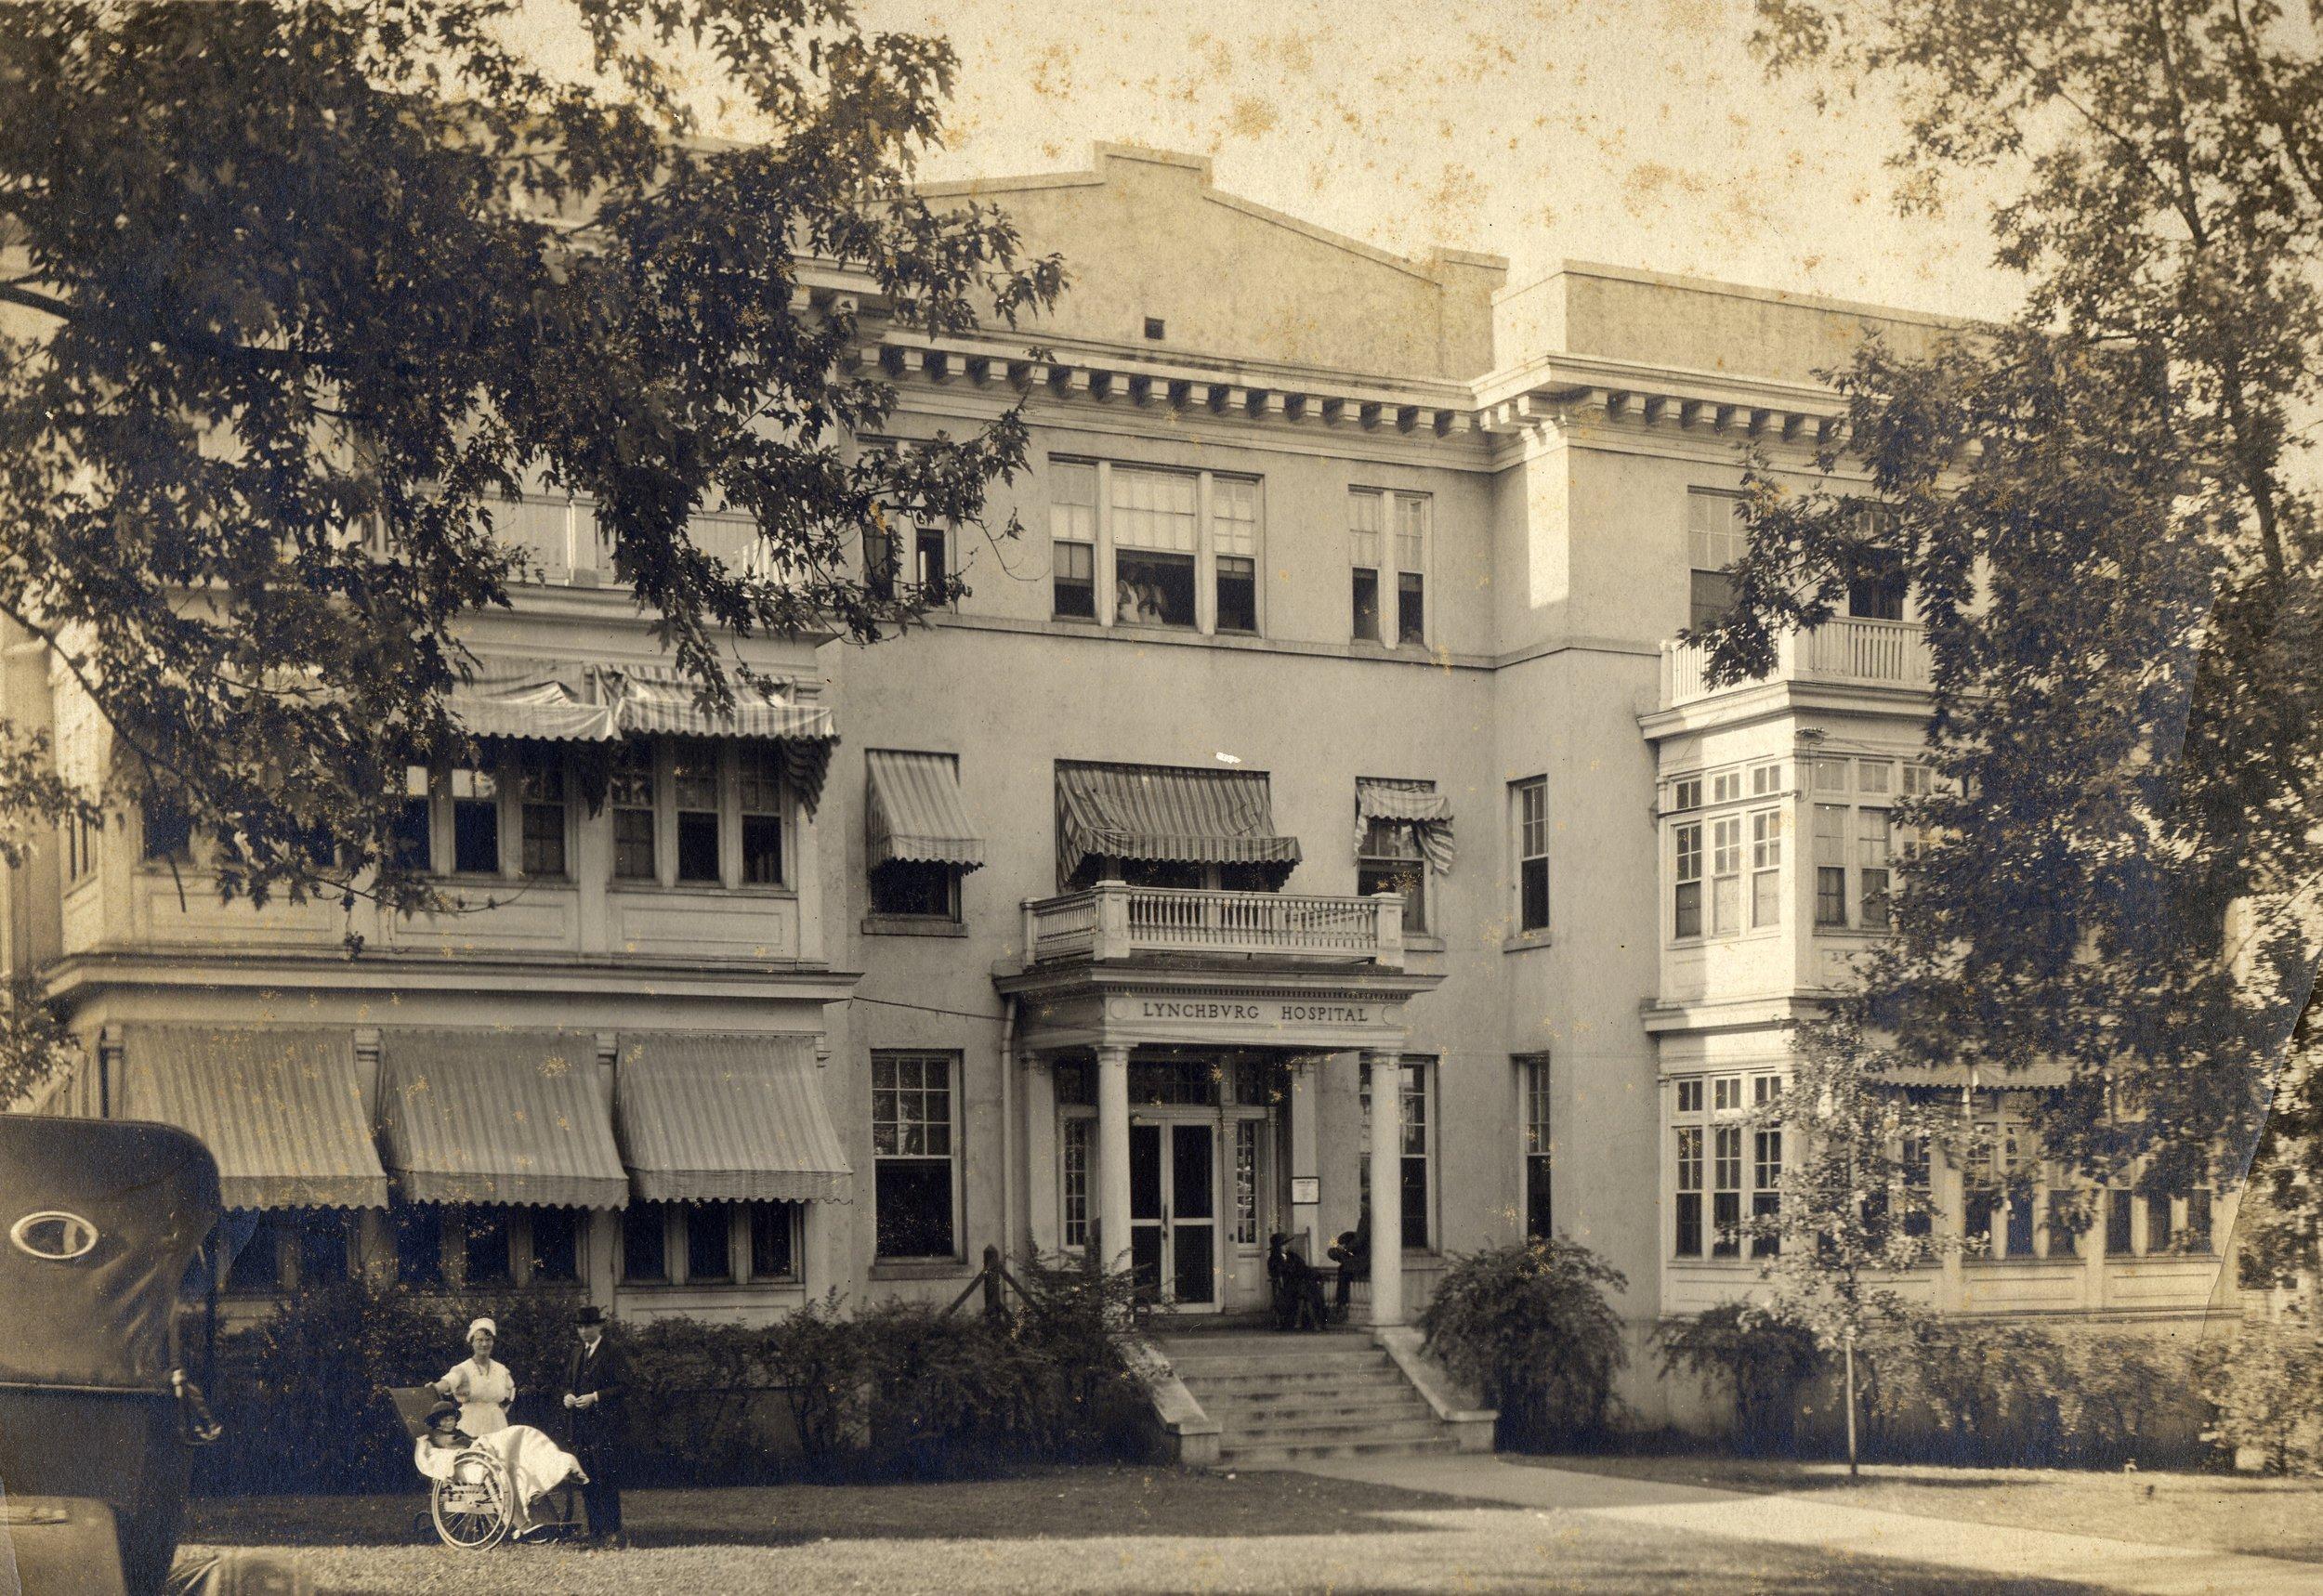 Lynchburg Hospital, built 1912 (now Tinbridge Manor)